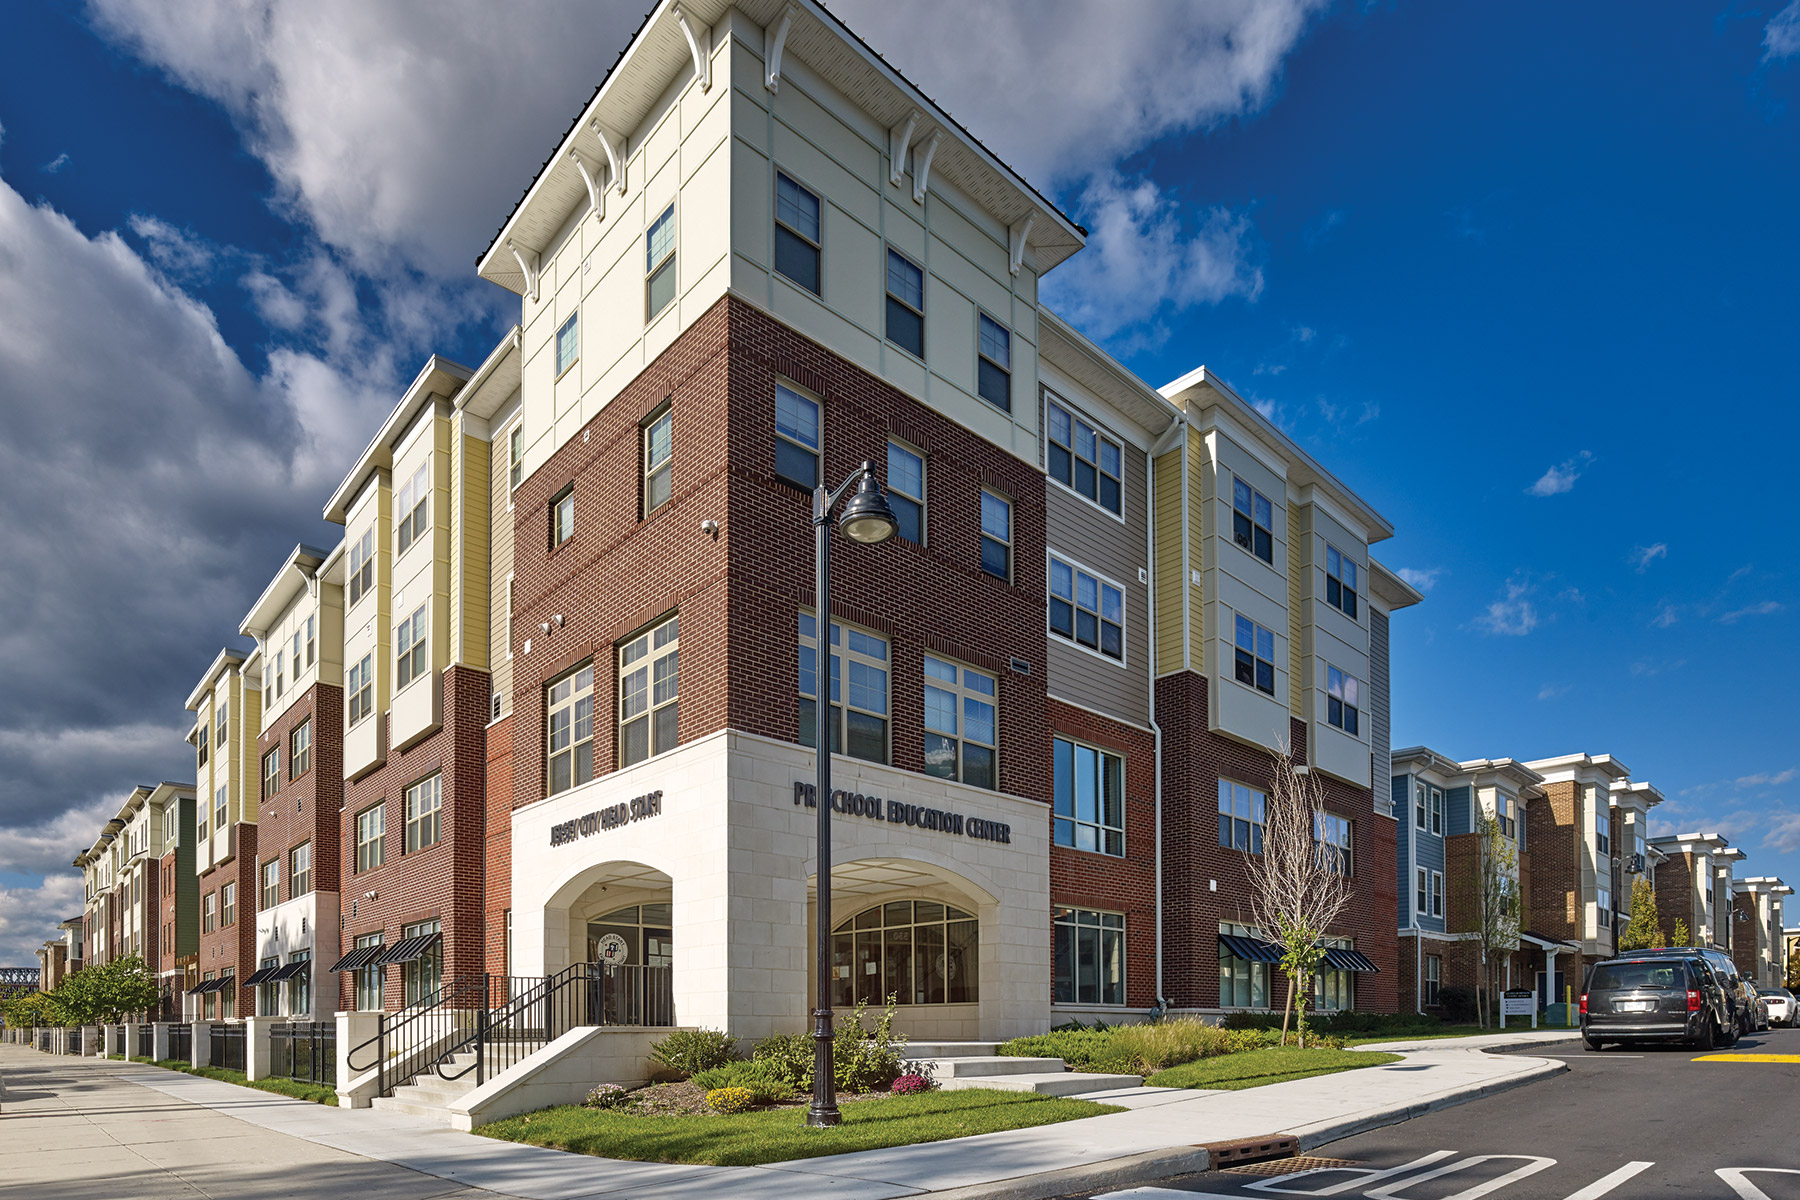 Public Housing Community Reborn in Jersey City| Housing ...